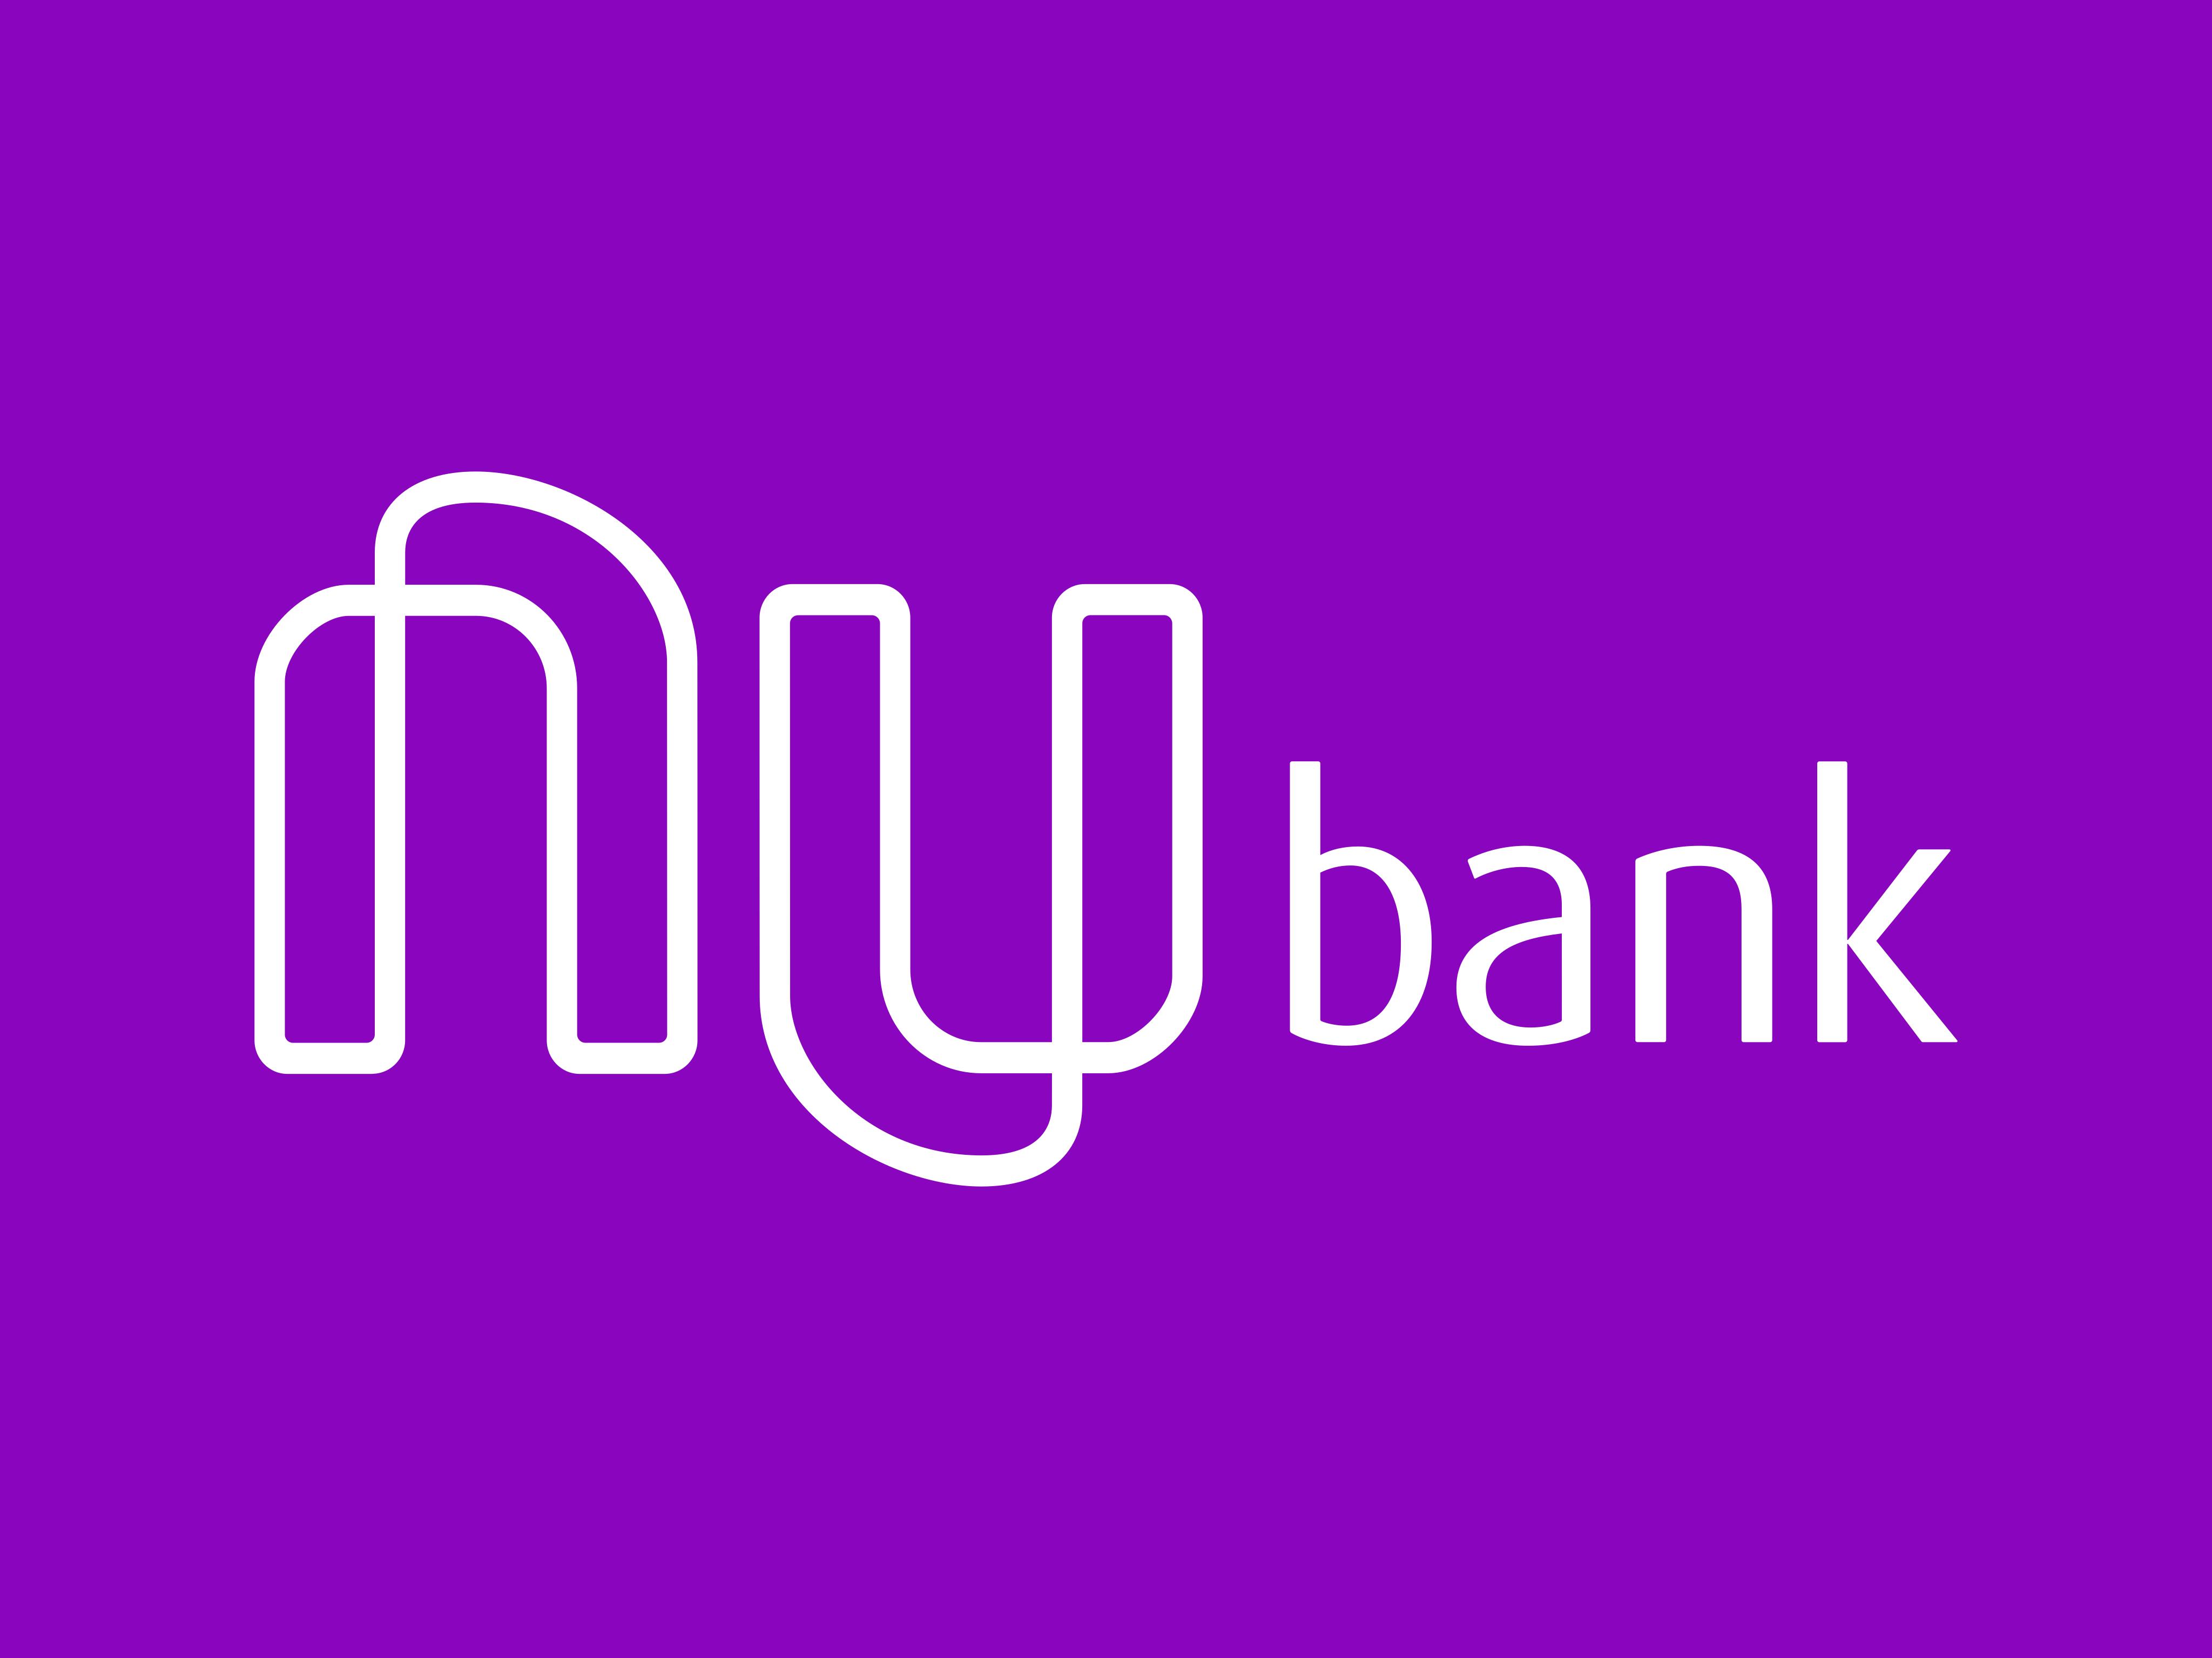 nubank logo 0 - Nubank Logo